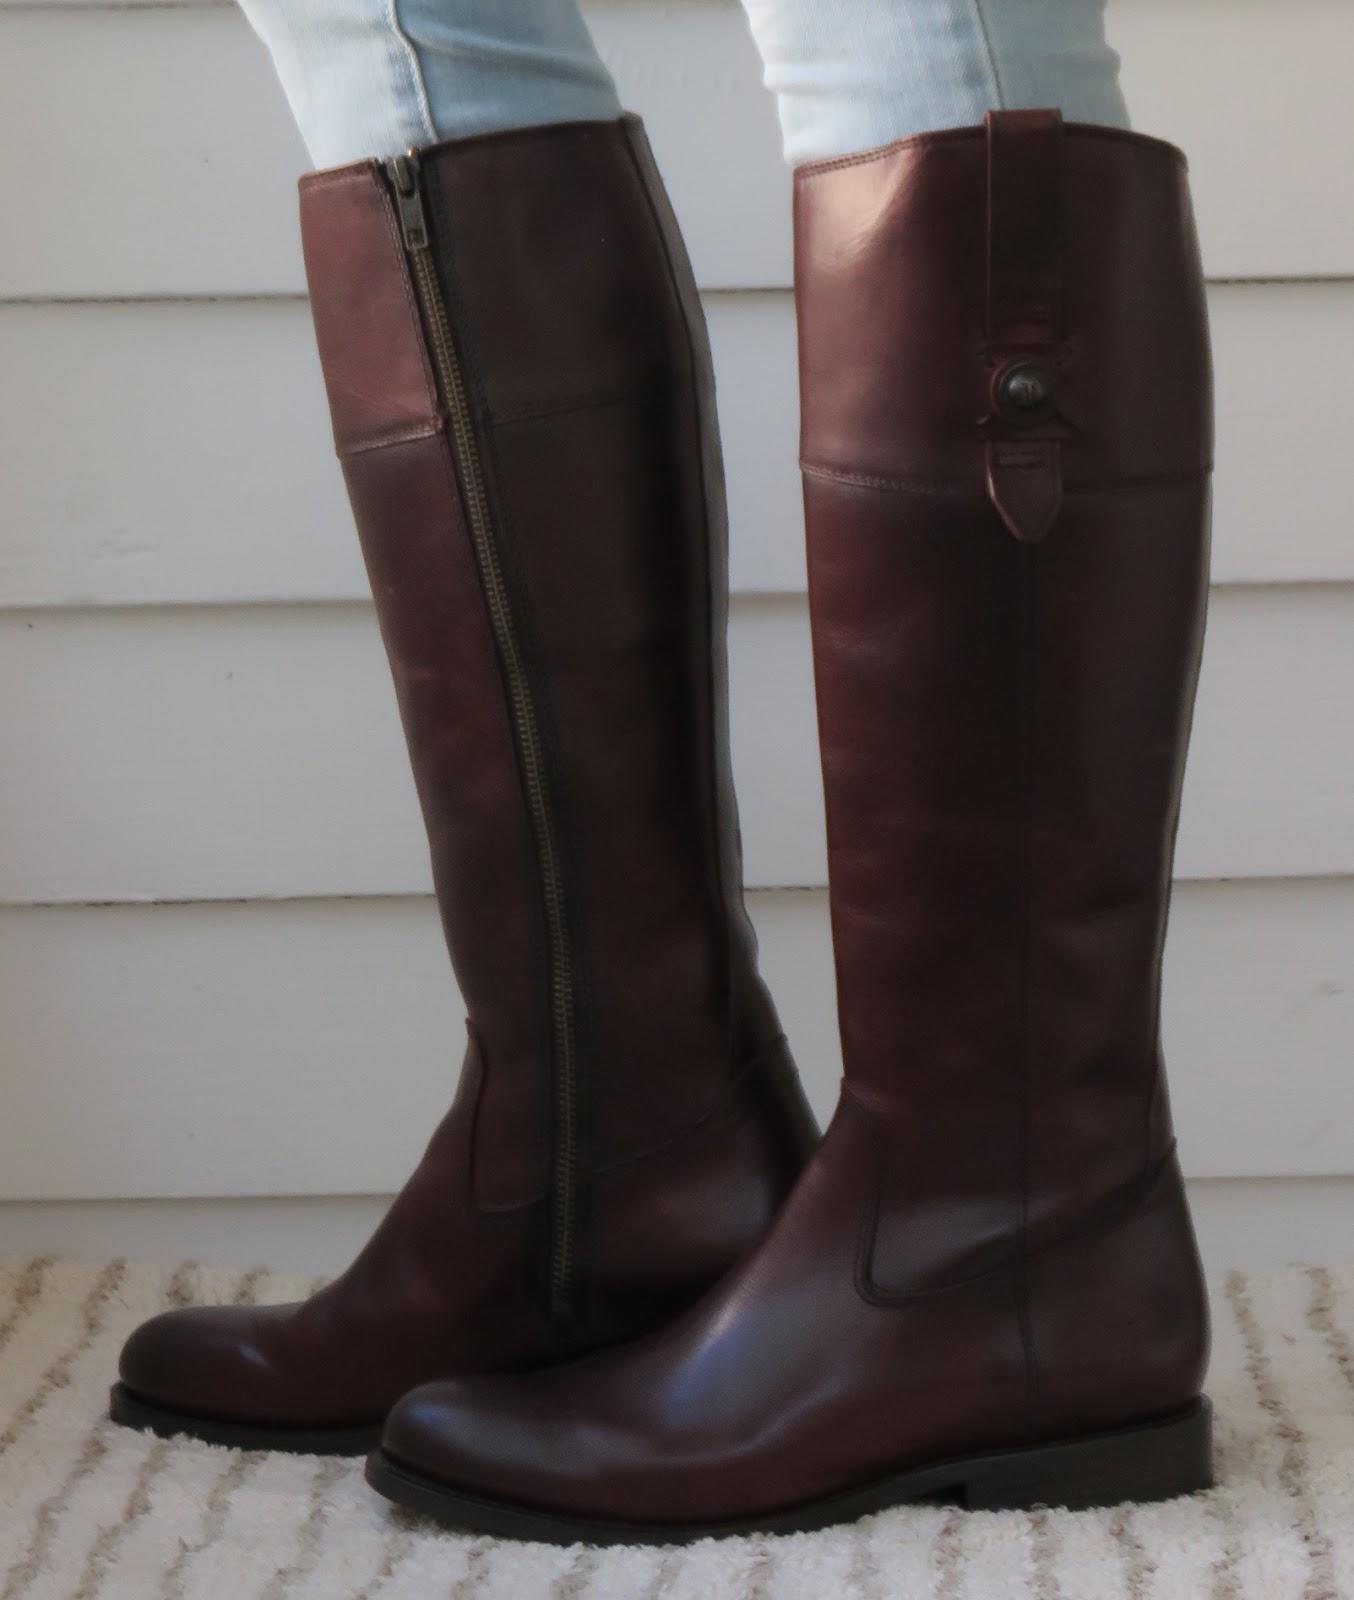 77019c353fe Based on reviews complaining of too-narrow calves